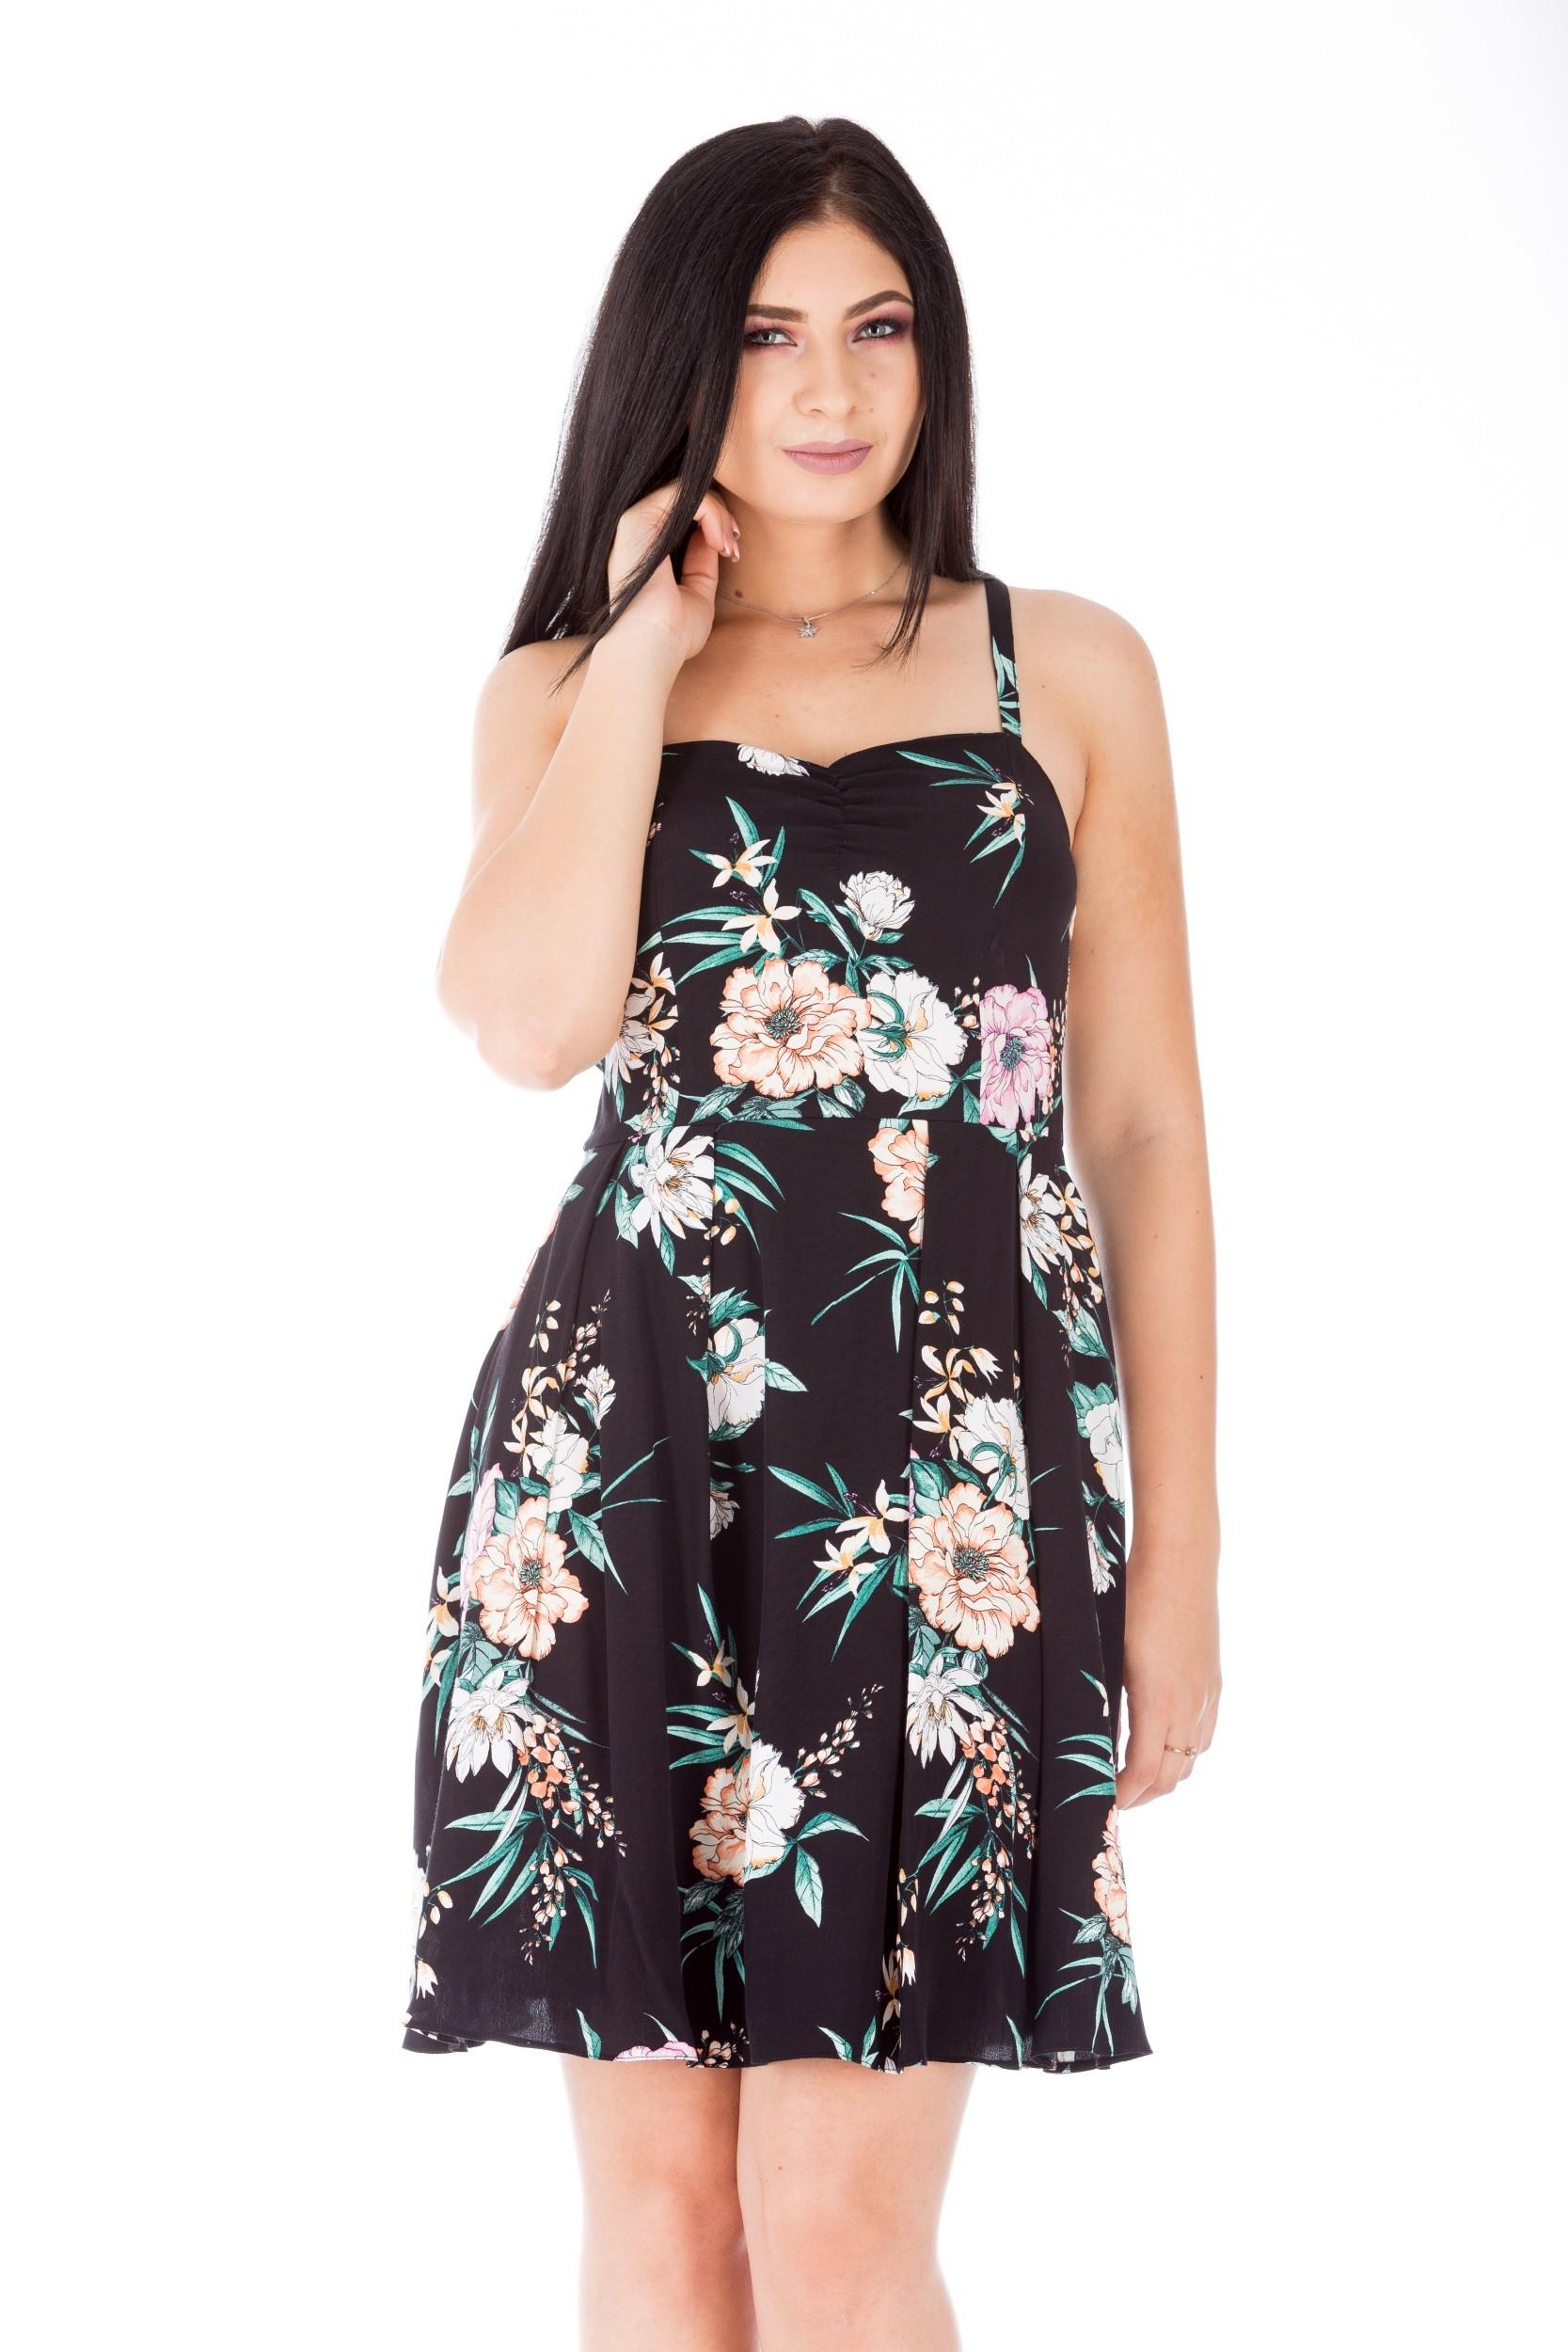 Rochie scurtă cu imprimeu floral pastel